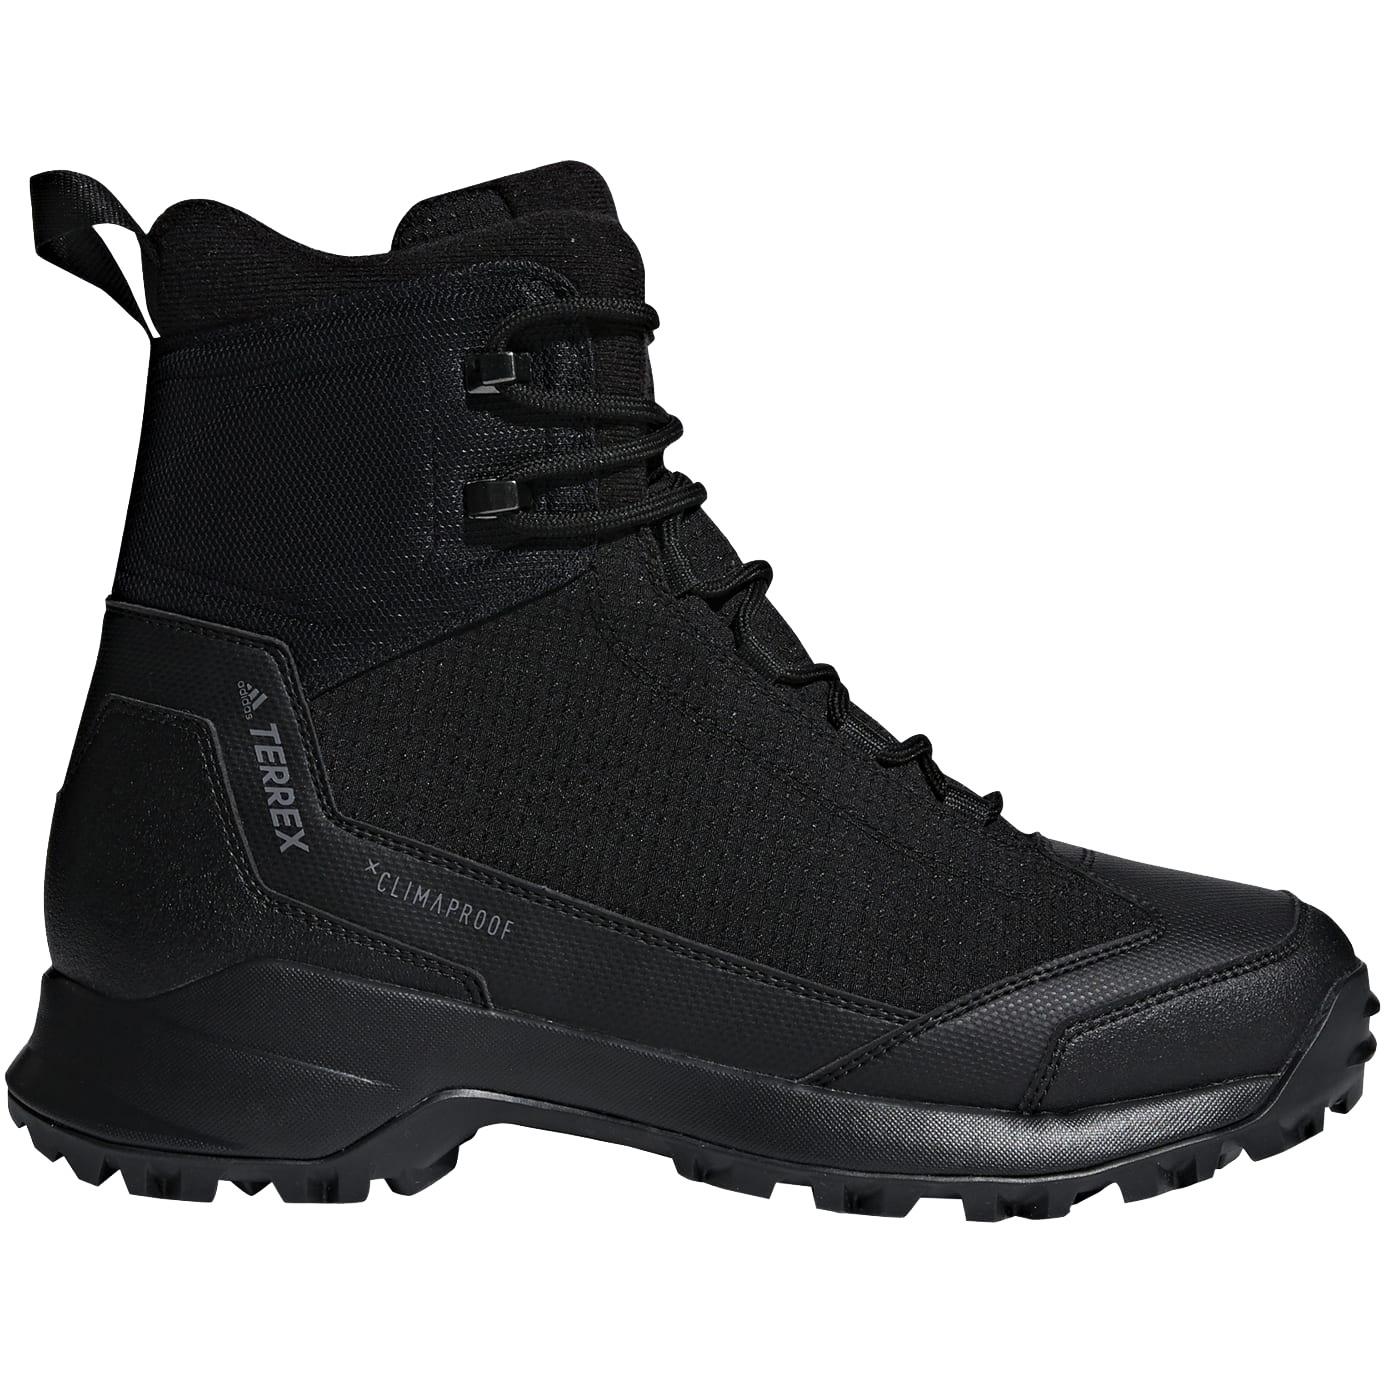 adidas Men's TERREX Frozetrack High Winter Hiking Shoes - core black/core black/grey four AC7838